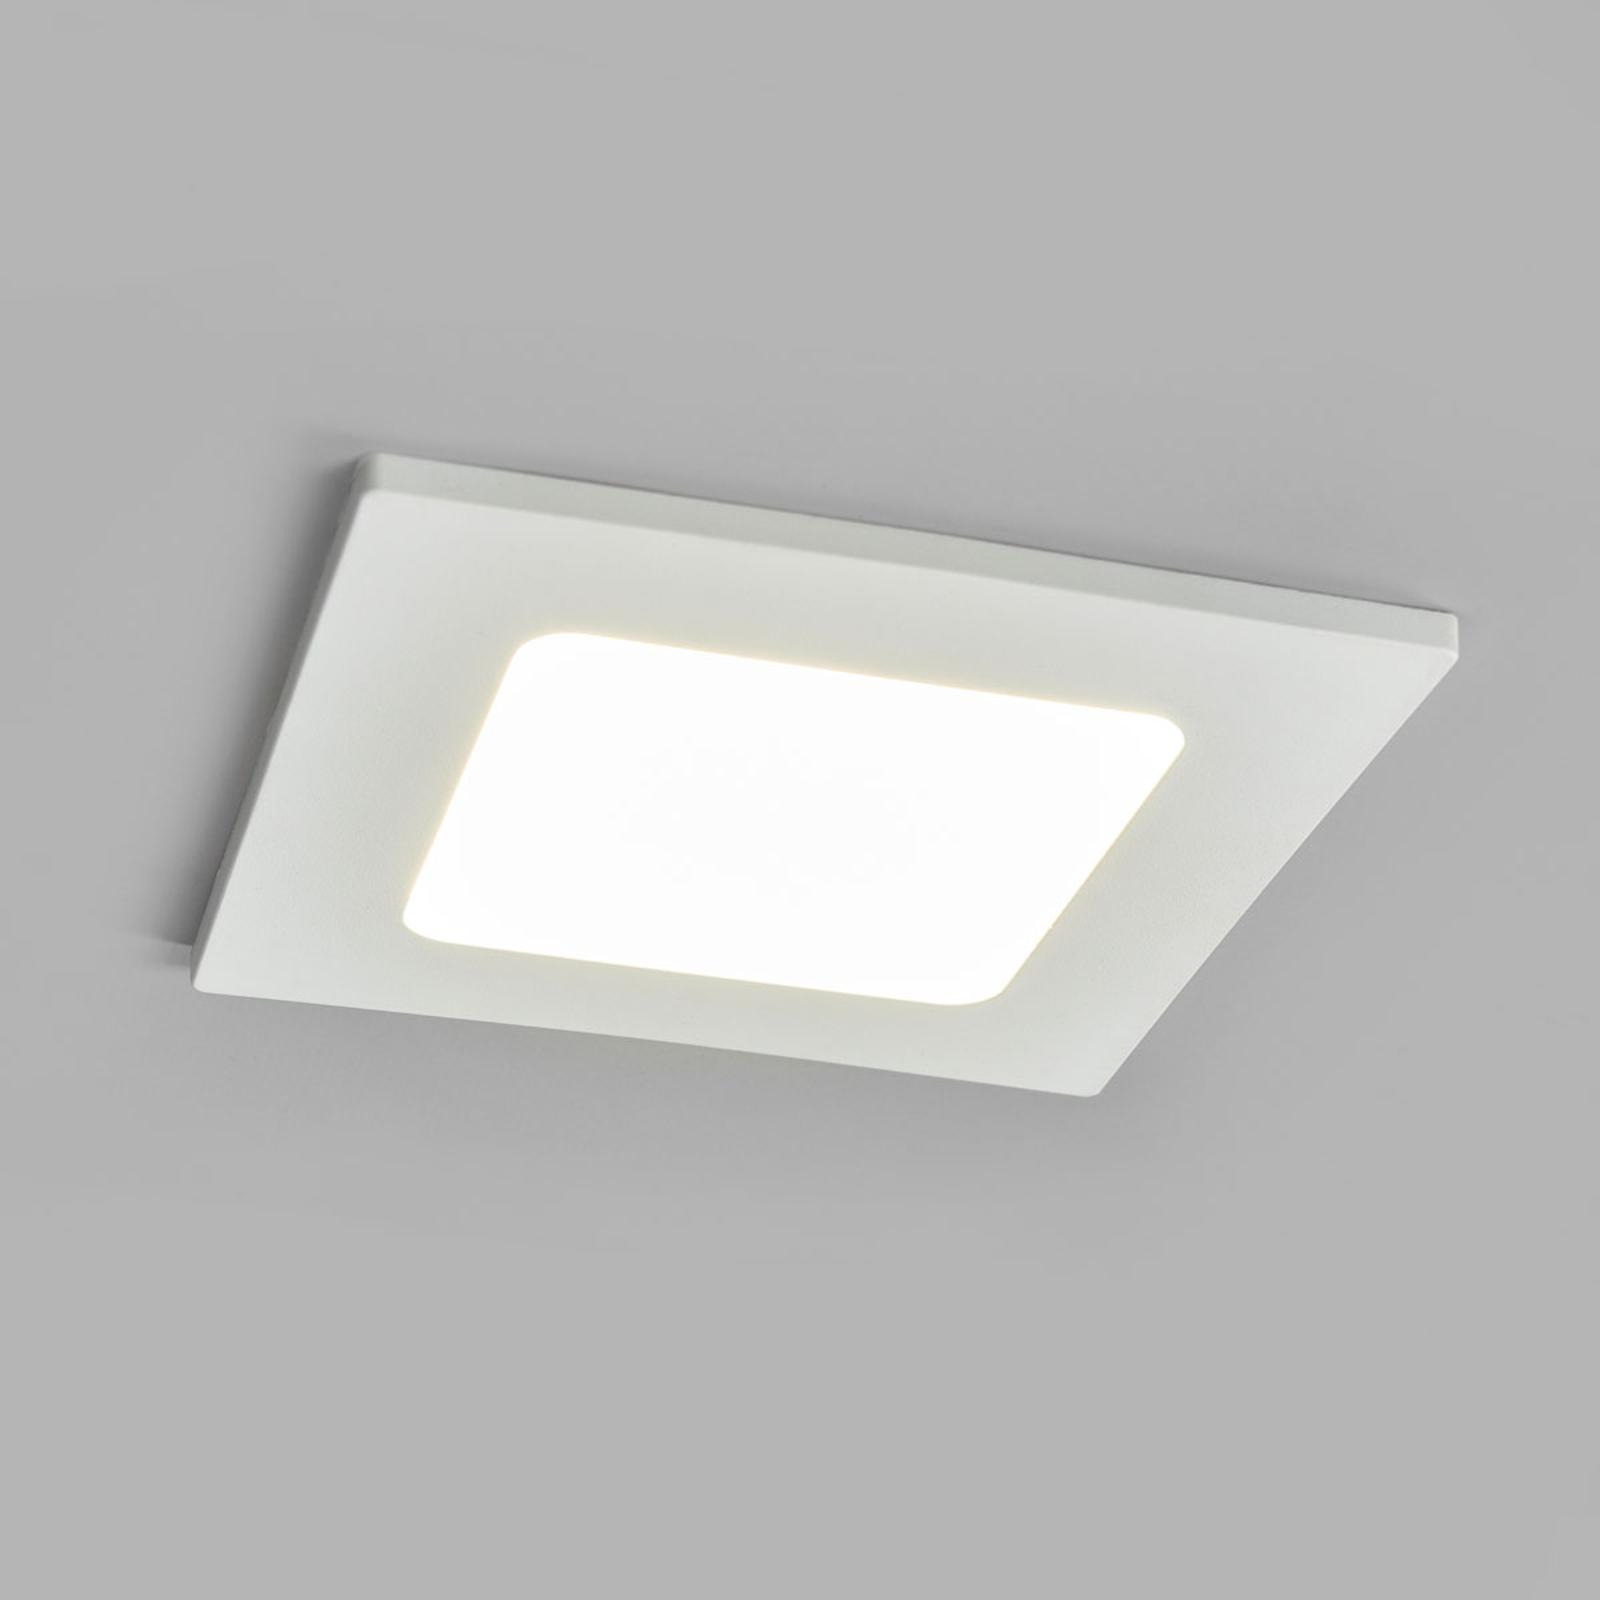 Joki LED downlight white 4000K angular 11.5cm_9978060_1